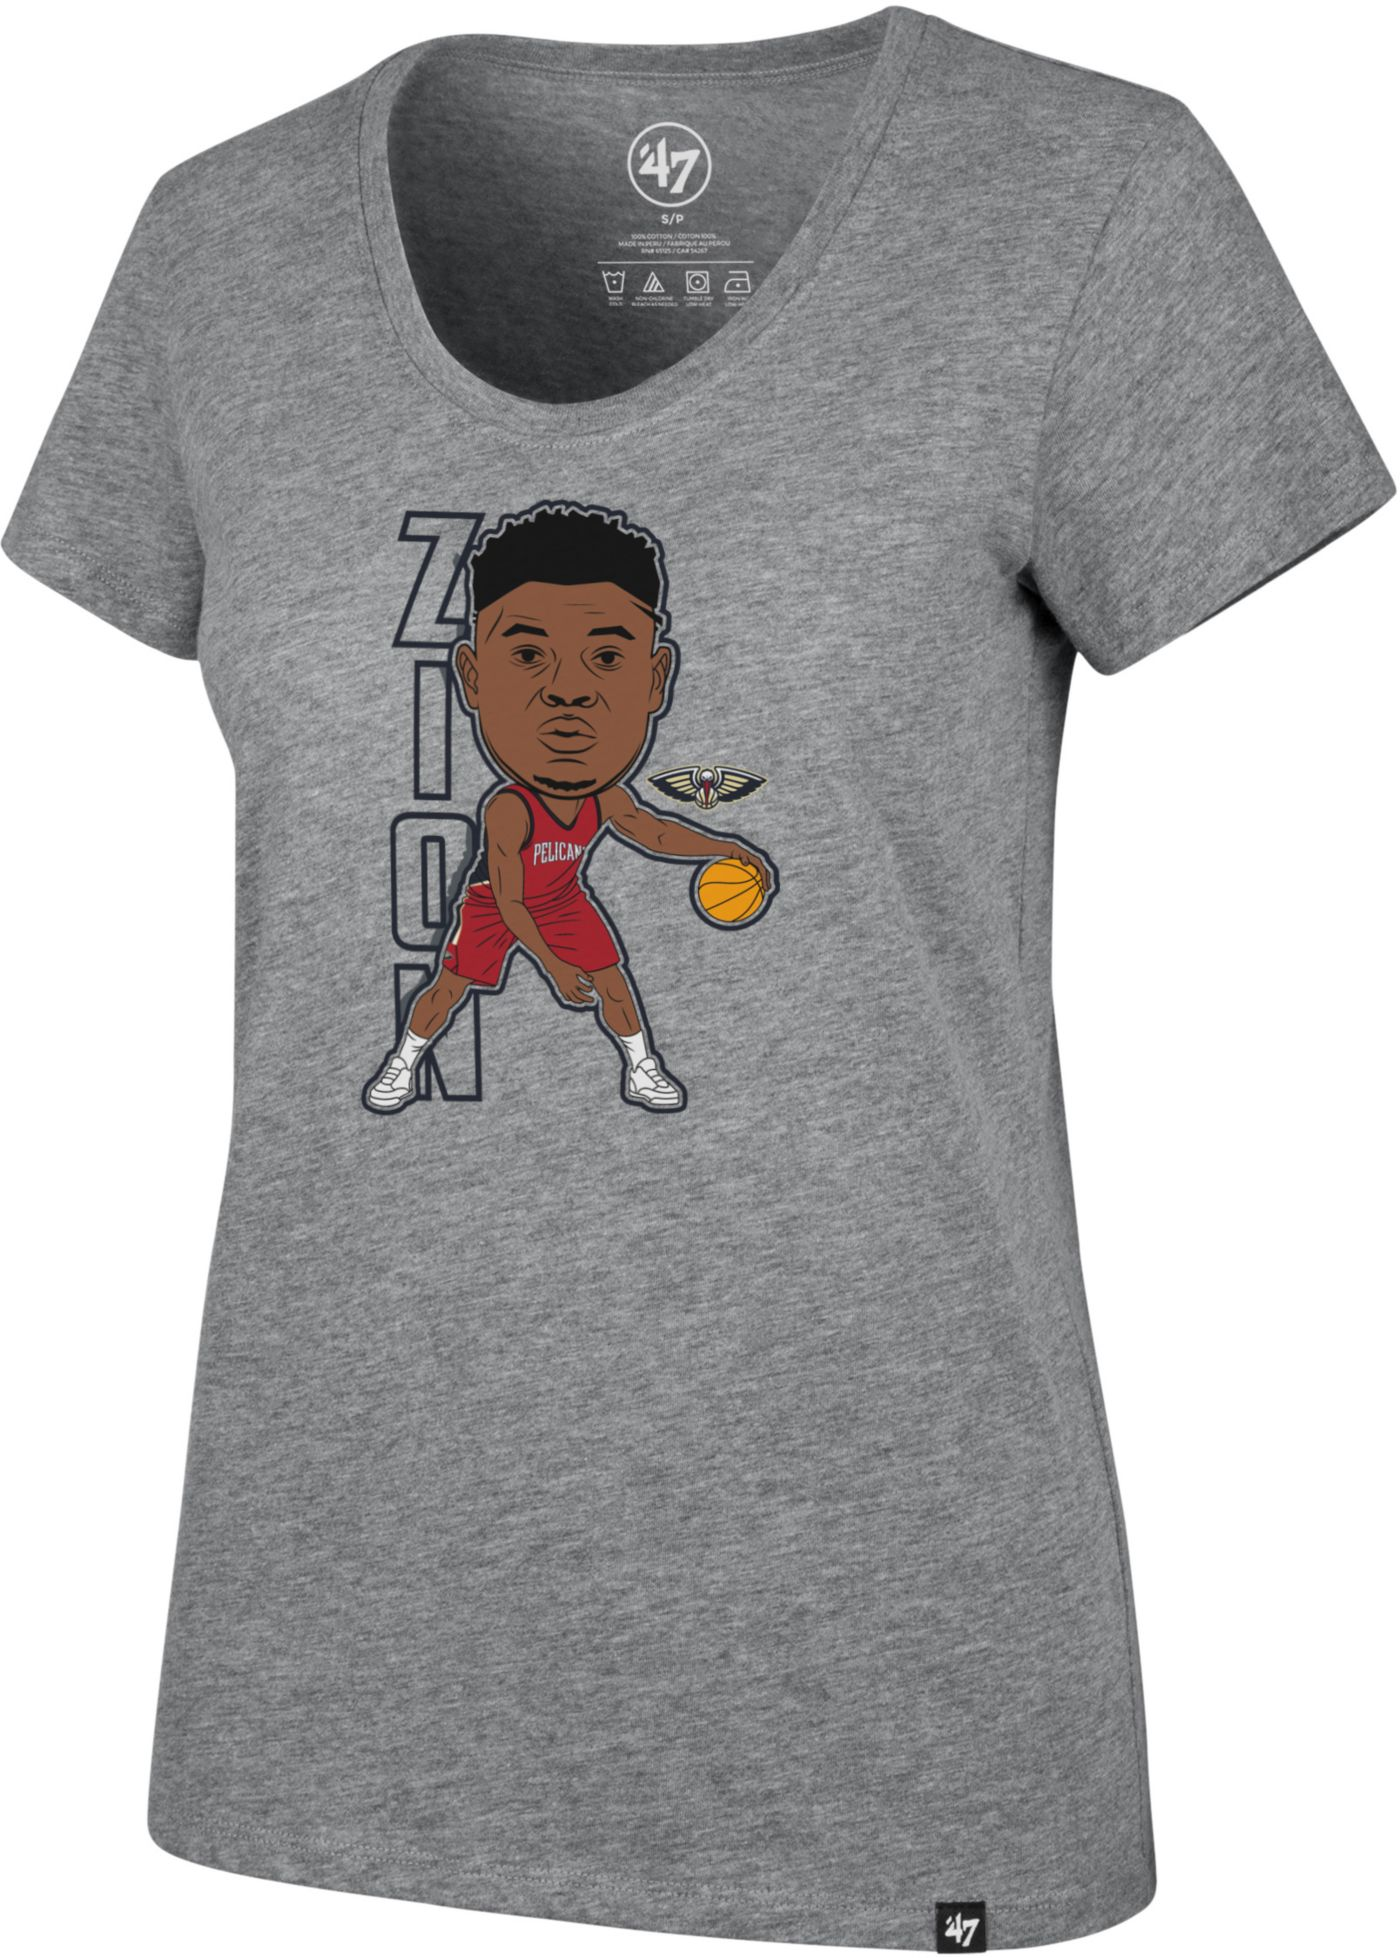 '47 Women's New Orleans Pelicans Zion Williamson Grey Scoop Neck T-Shirt